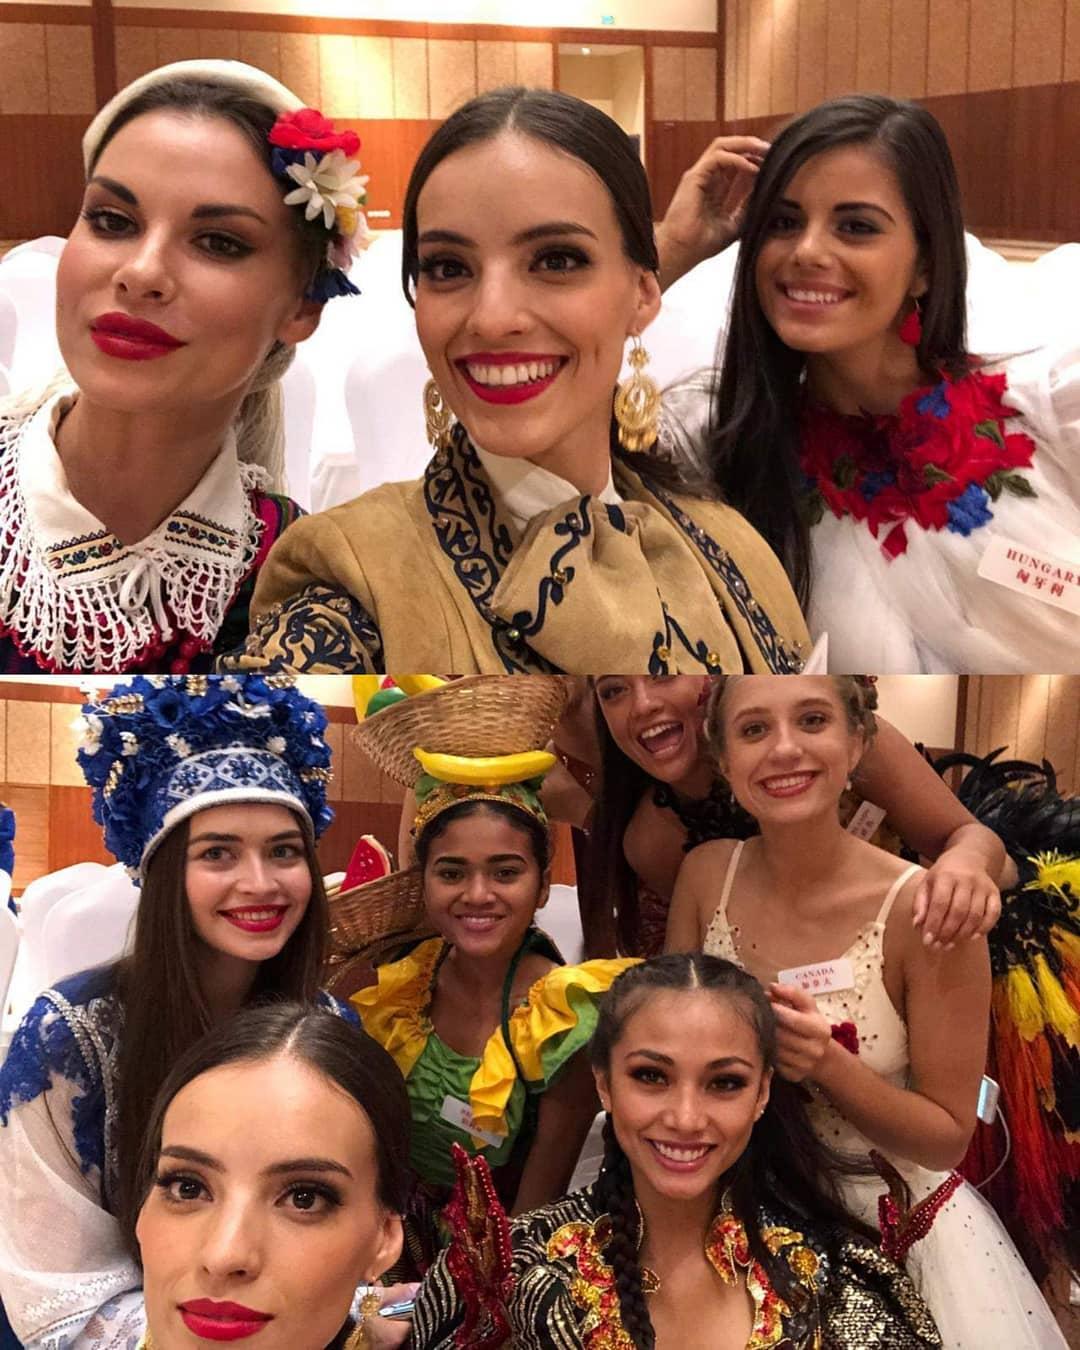 vanessa ponce de leon, miss world 2018. I - Página 5 44902010